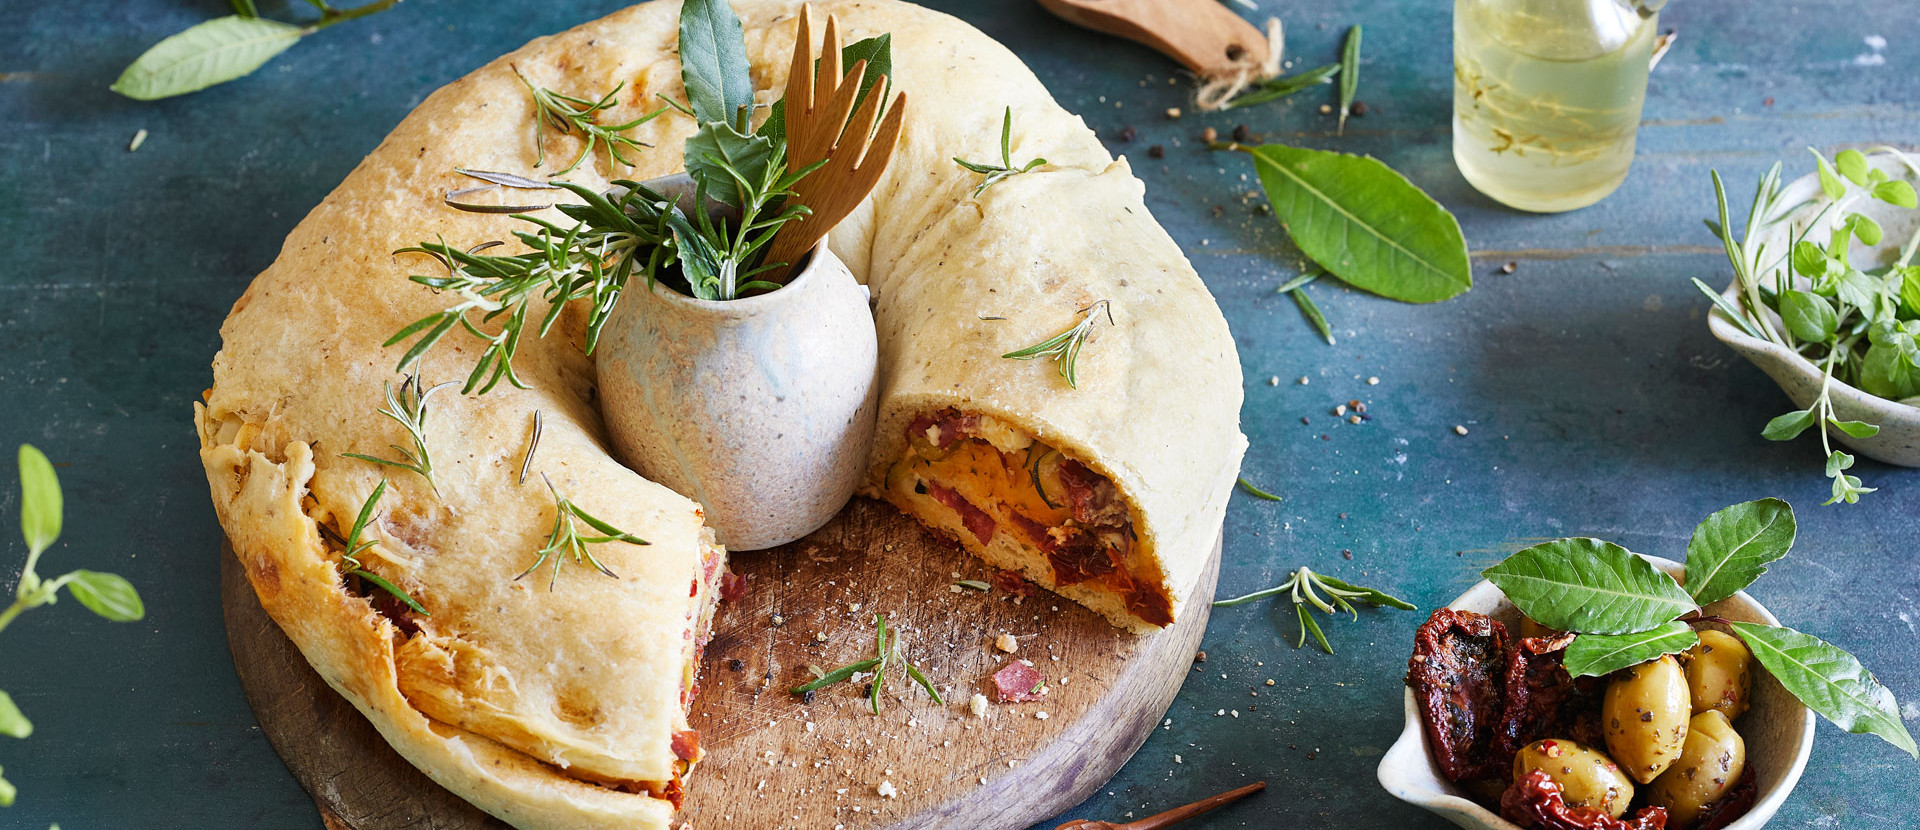 mediterran gefülltes Brot